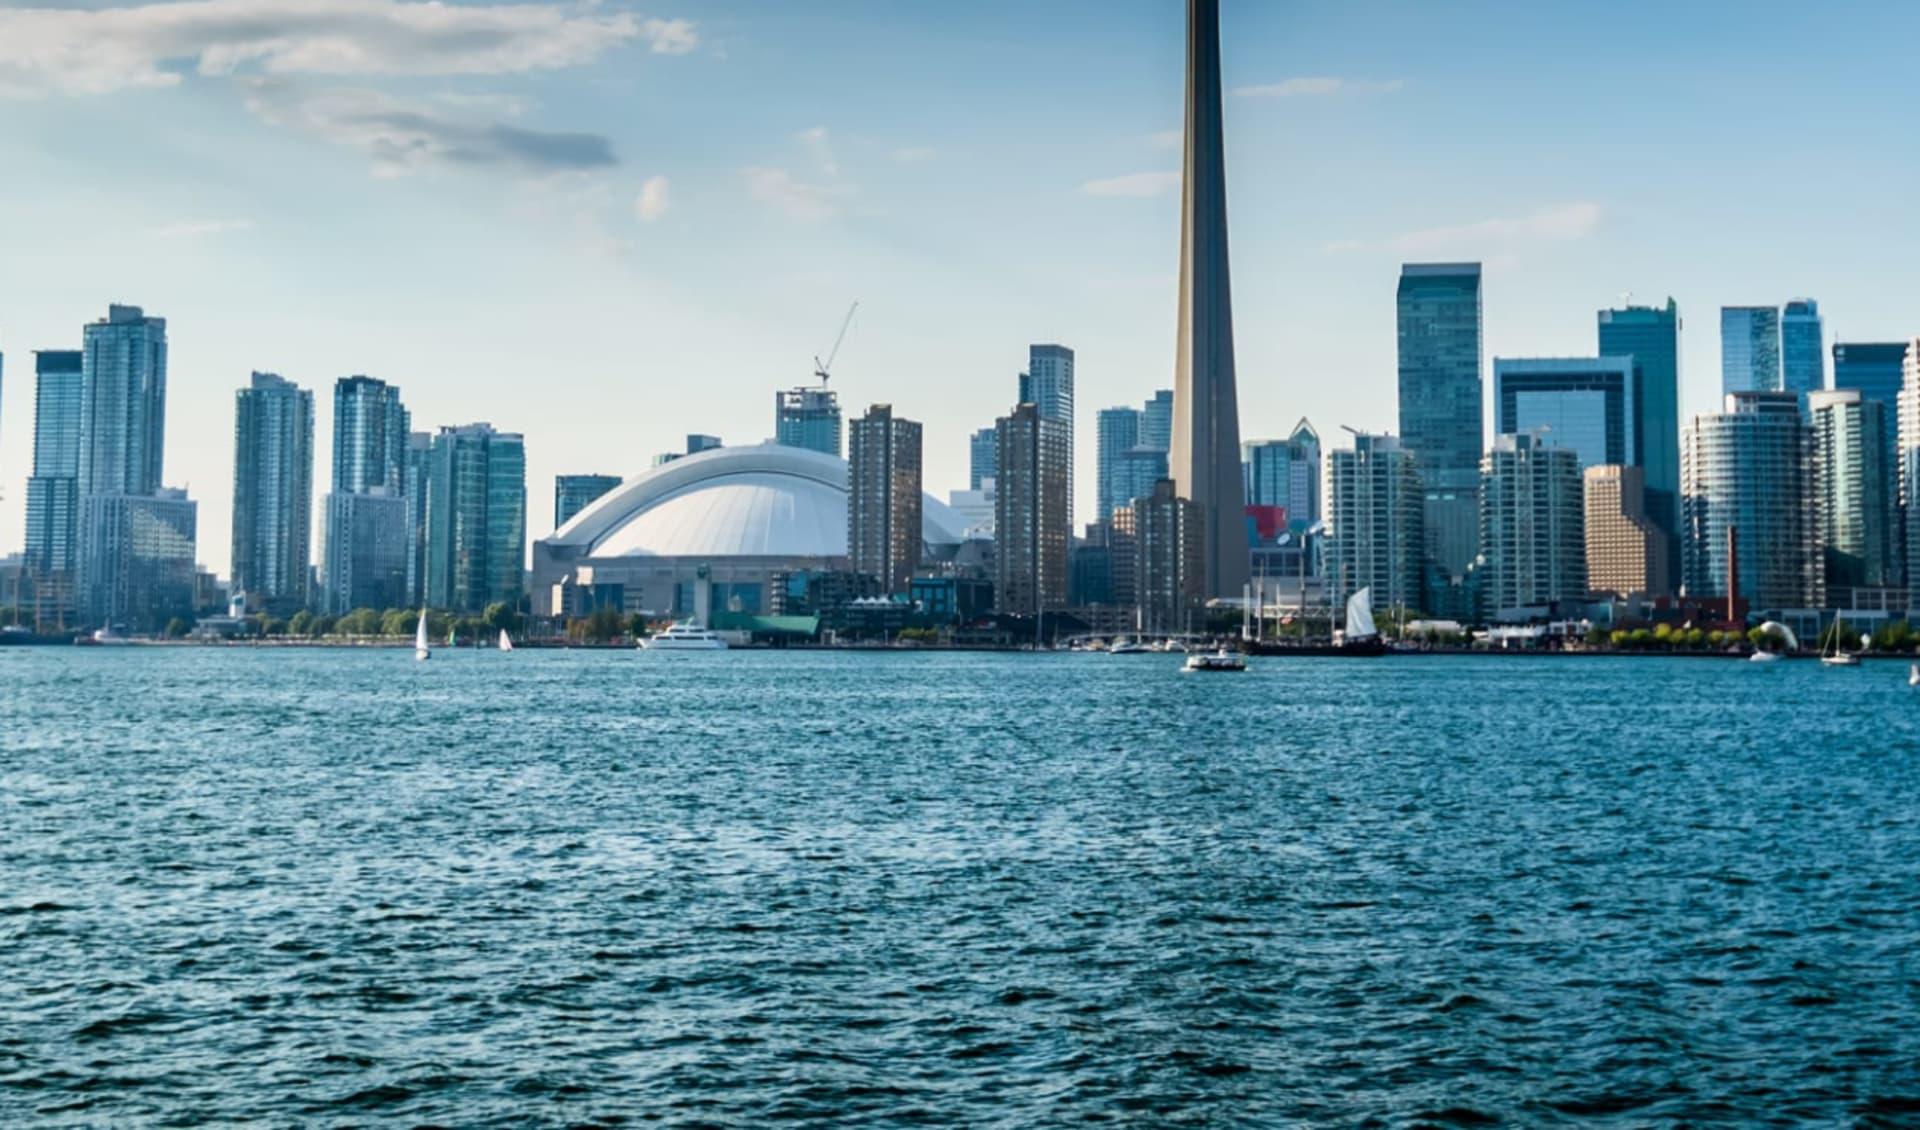 Kanadische Kontraste Ostkanada ab Toronto: Kanada - Toronto - Skyline mit Meer im Vordergrund